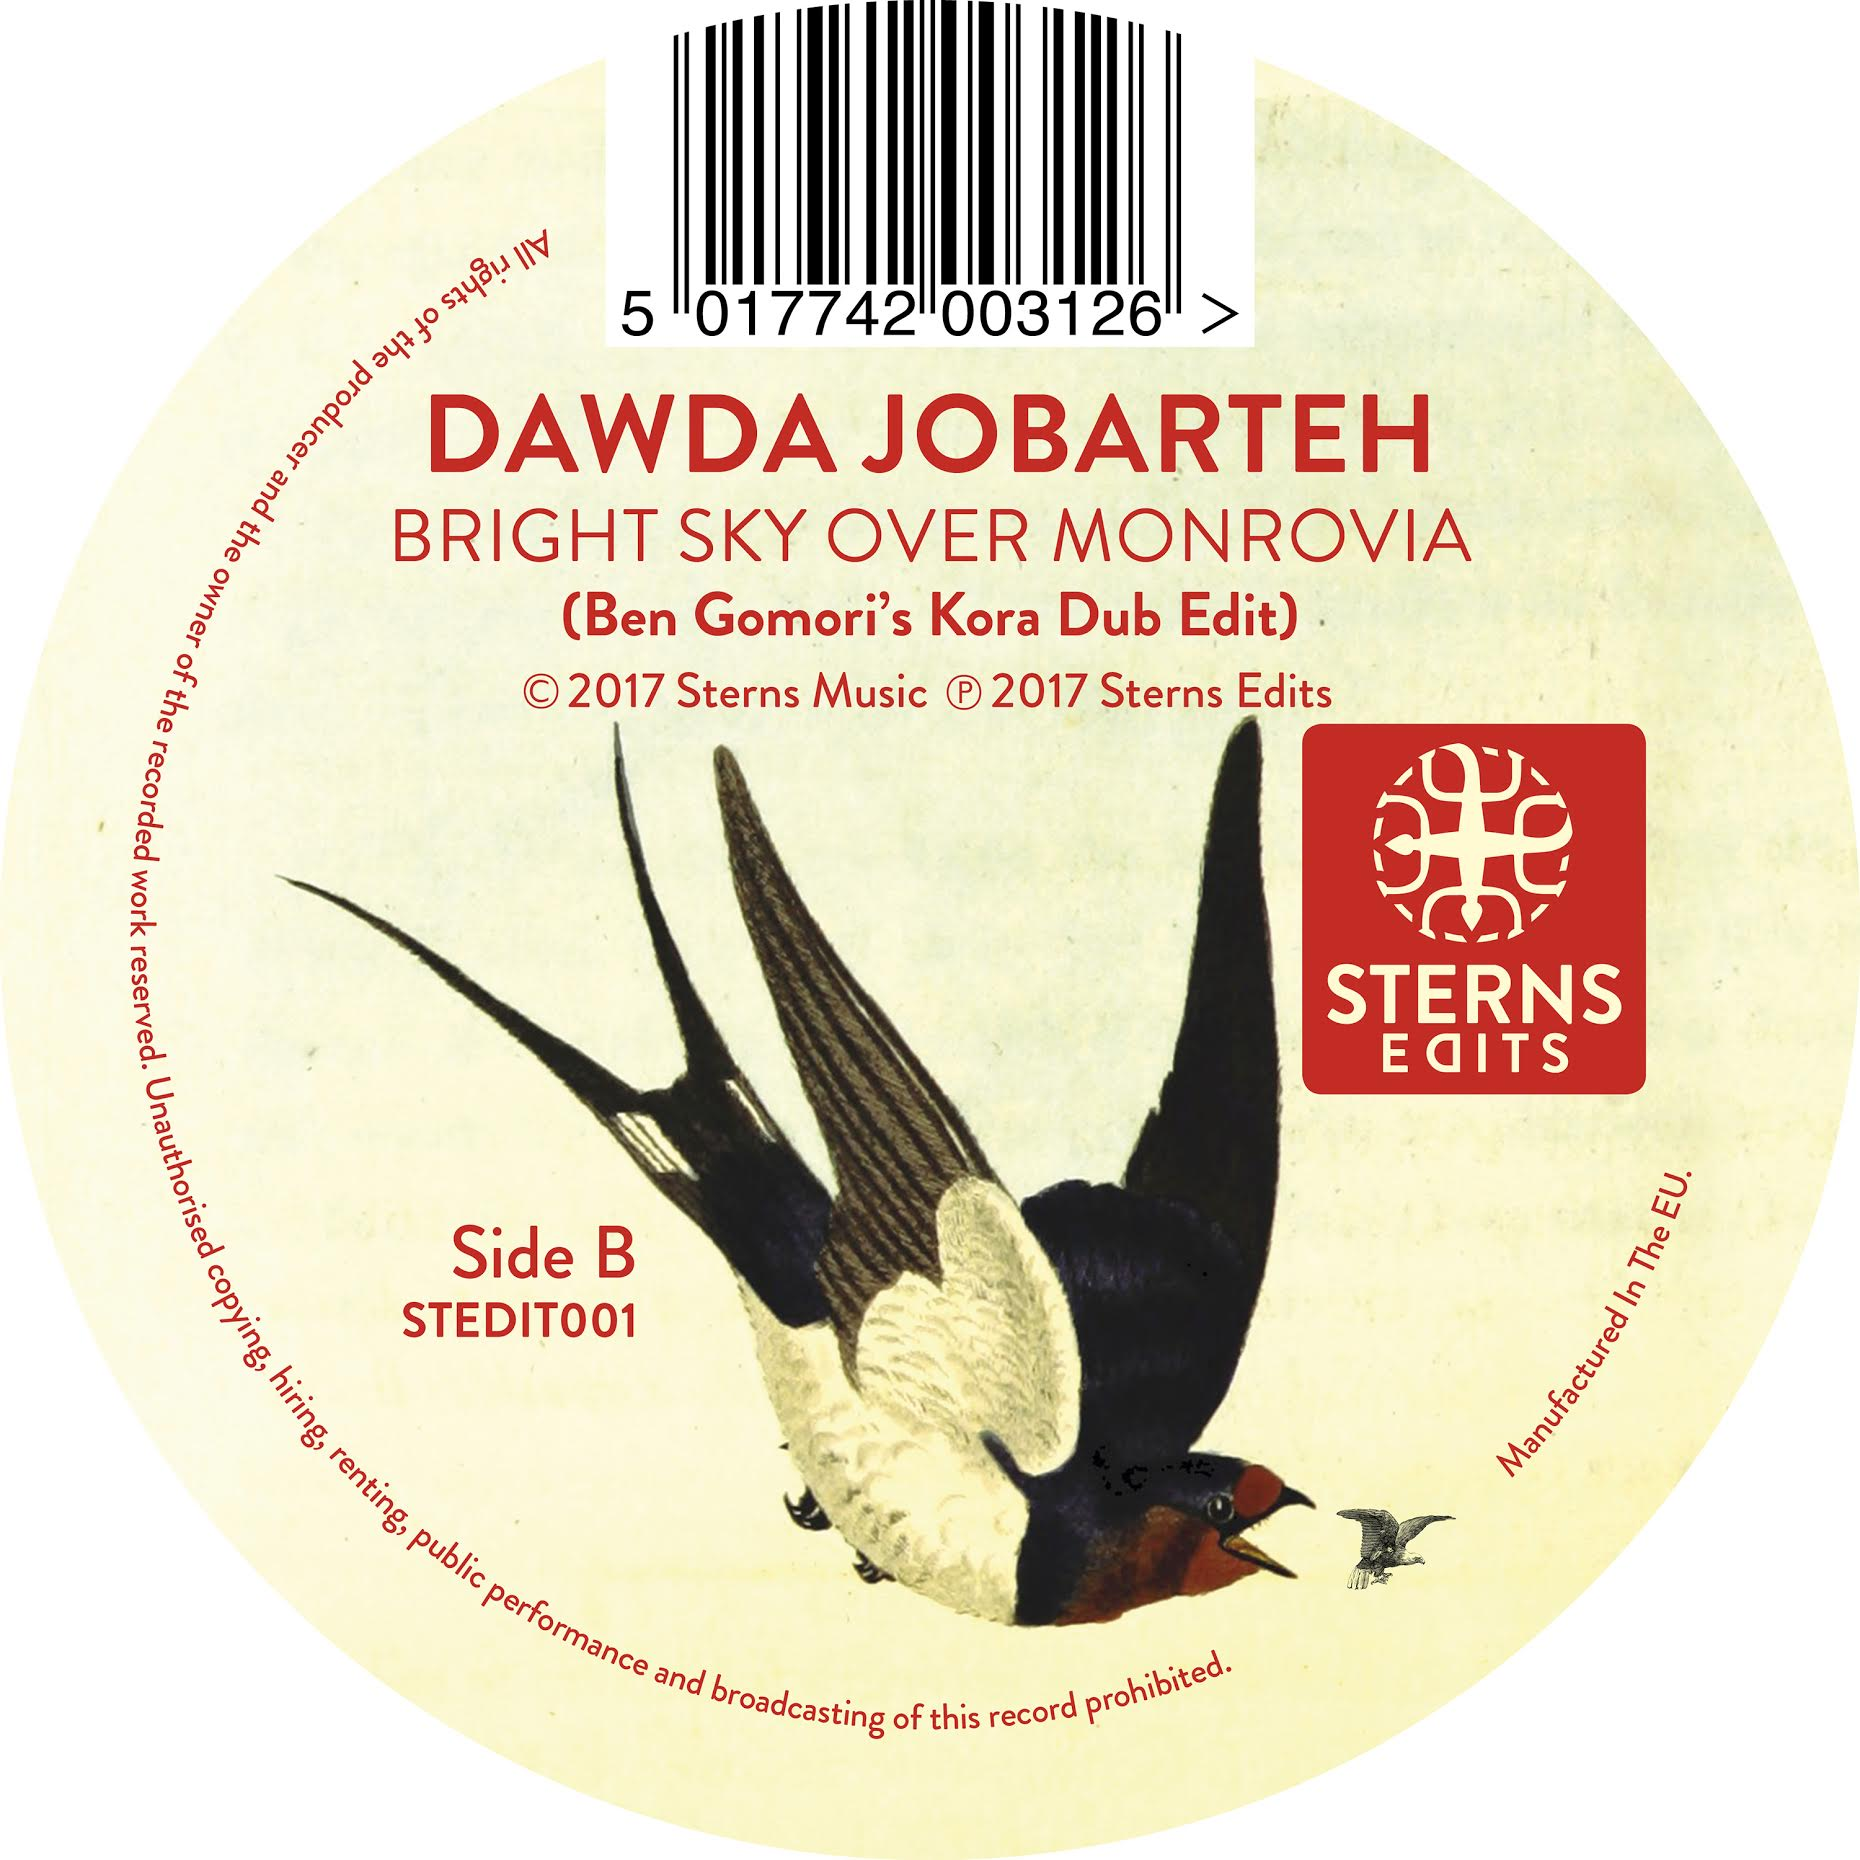 PREMIERE – Dawda Jobarteh – Bright Sky Over Monrovia (Ben Gomori's Kora Edit)